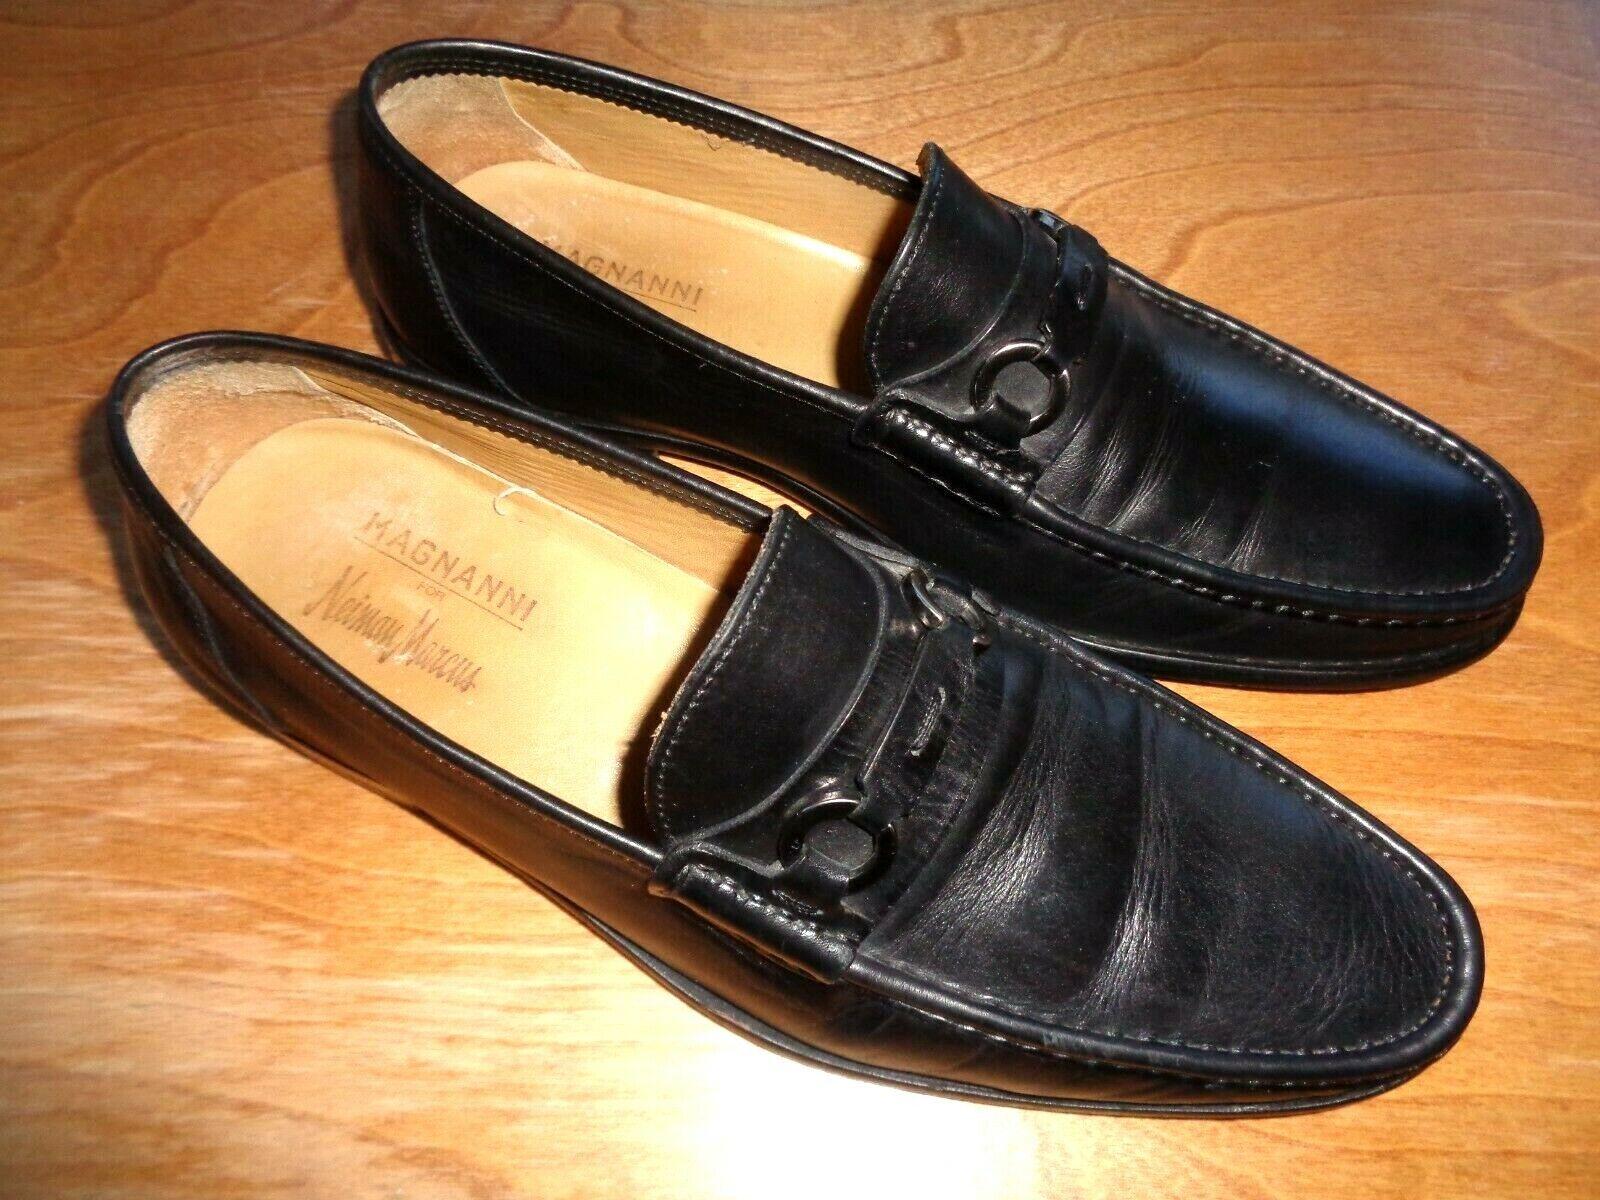 Magnanni, Nieman Marcus Leather Loafers shoes  Men's Sz 8 1 2 Medium- Black